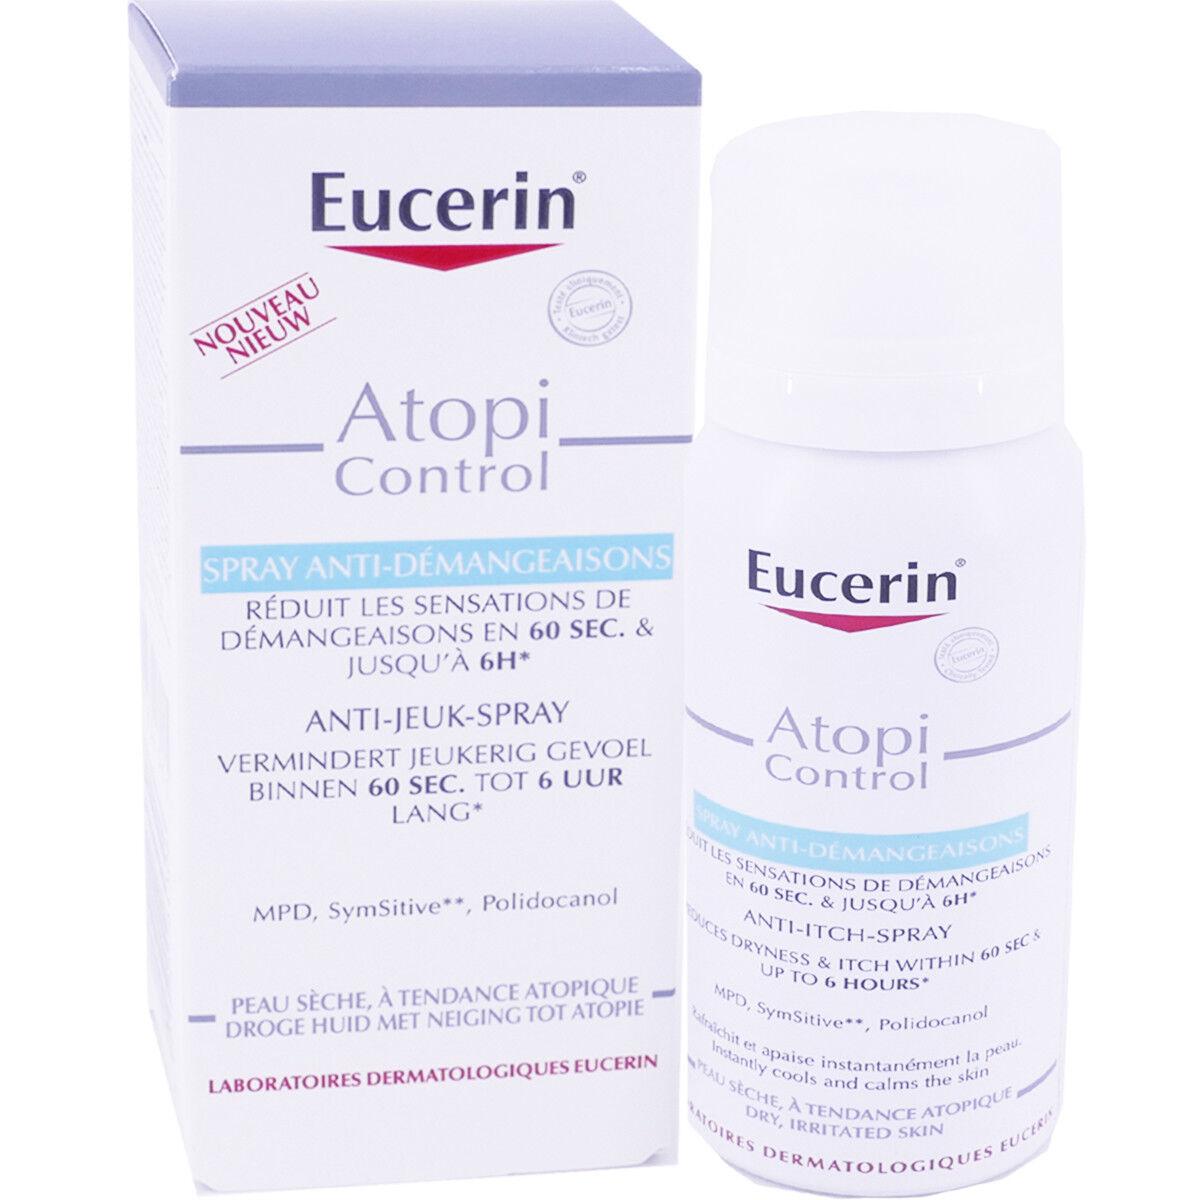 Eucerin atopi control spray anti-dÉmangeaisons 50 ml